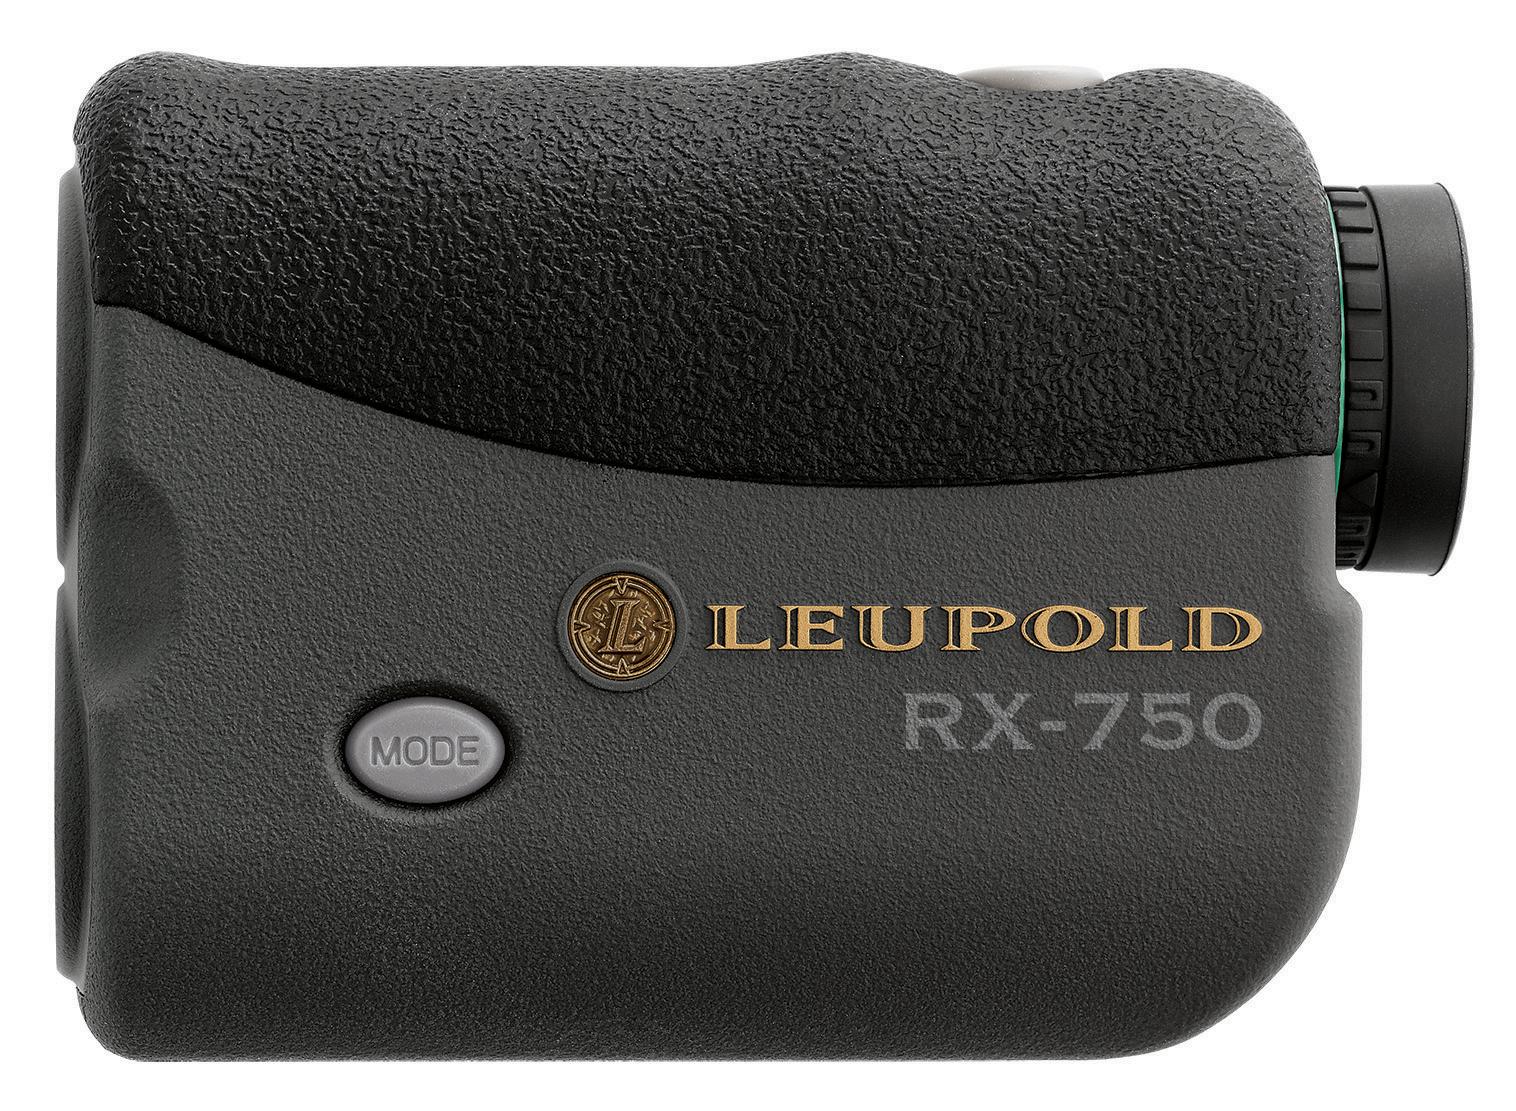 Entfernungsmesser Range 600 : Rx 750 tbr digital laser rangefinder rangefinders leupold